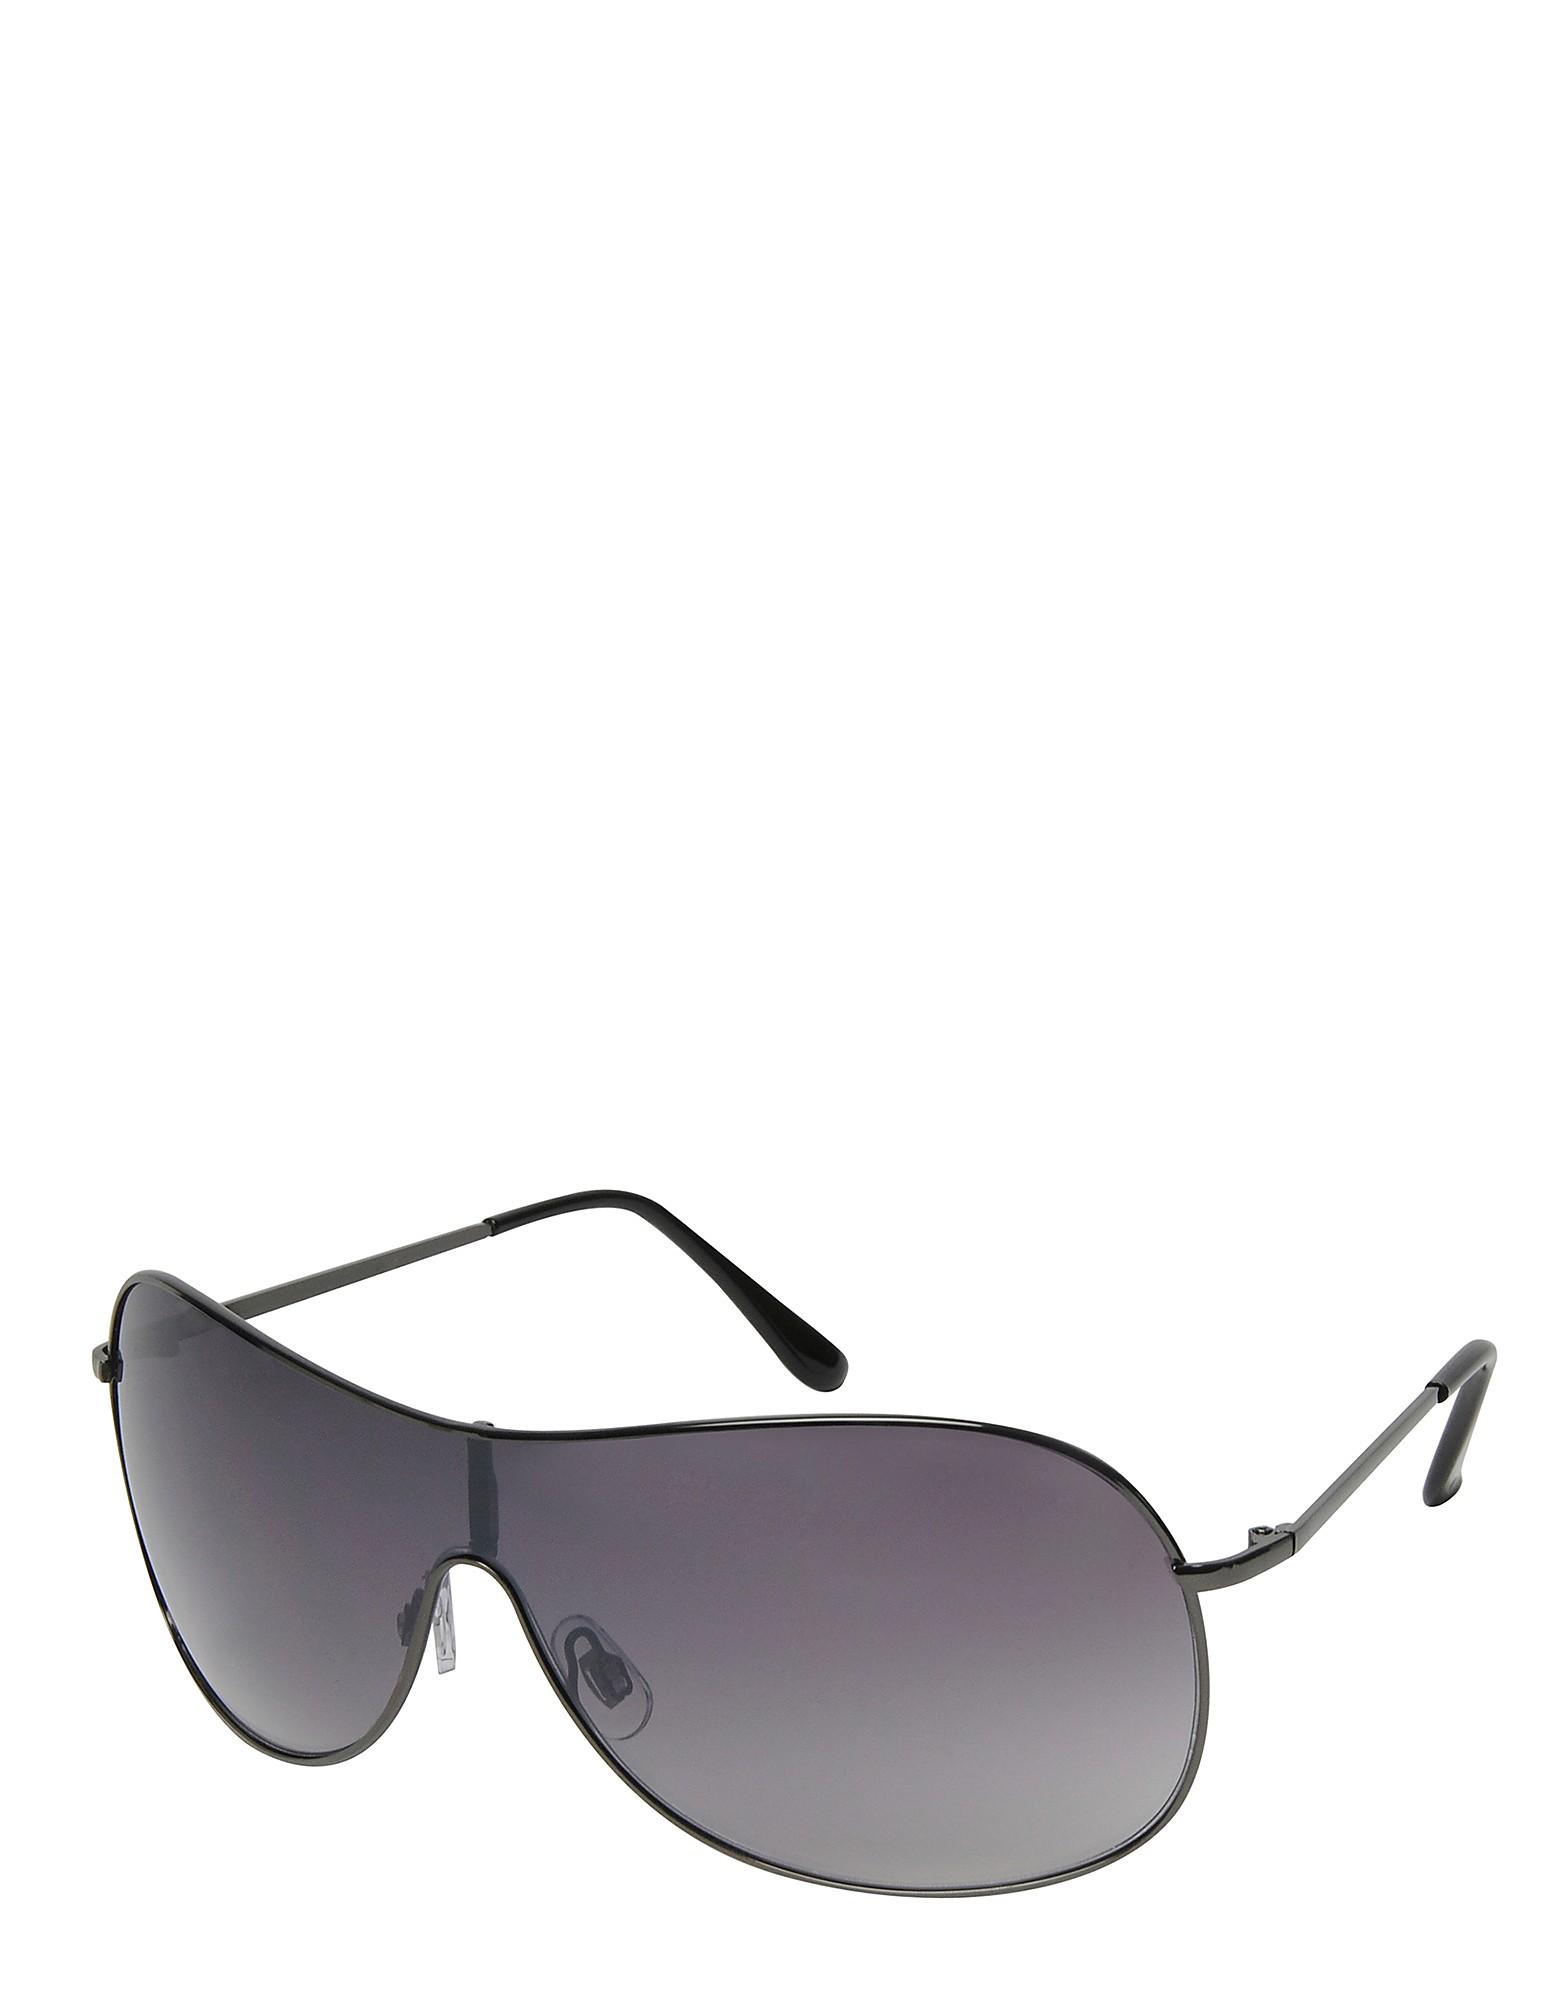 Brookhaven Jamie Visor Sunglasses - Only at JD - Black - Mens, Black